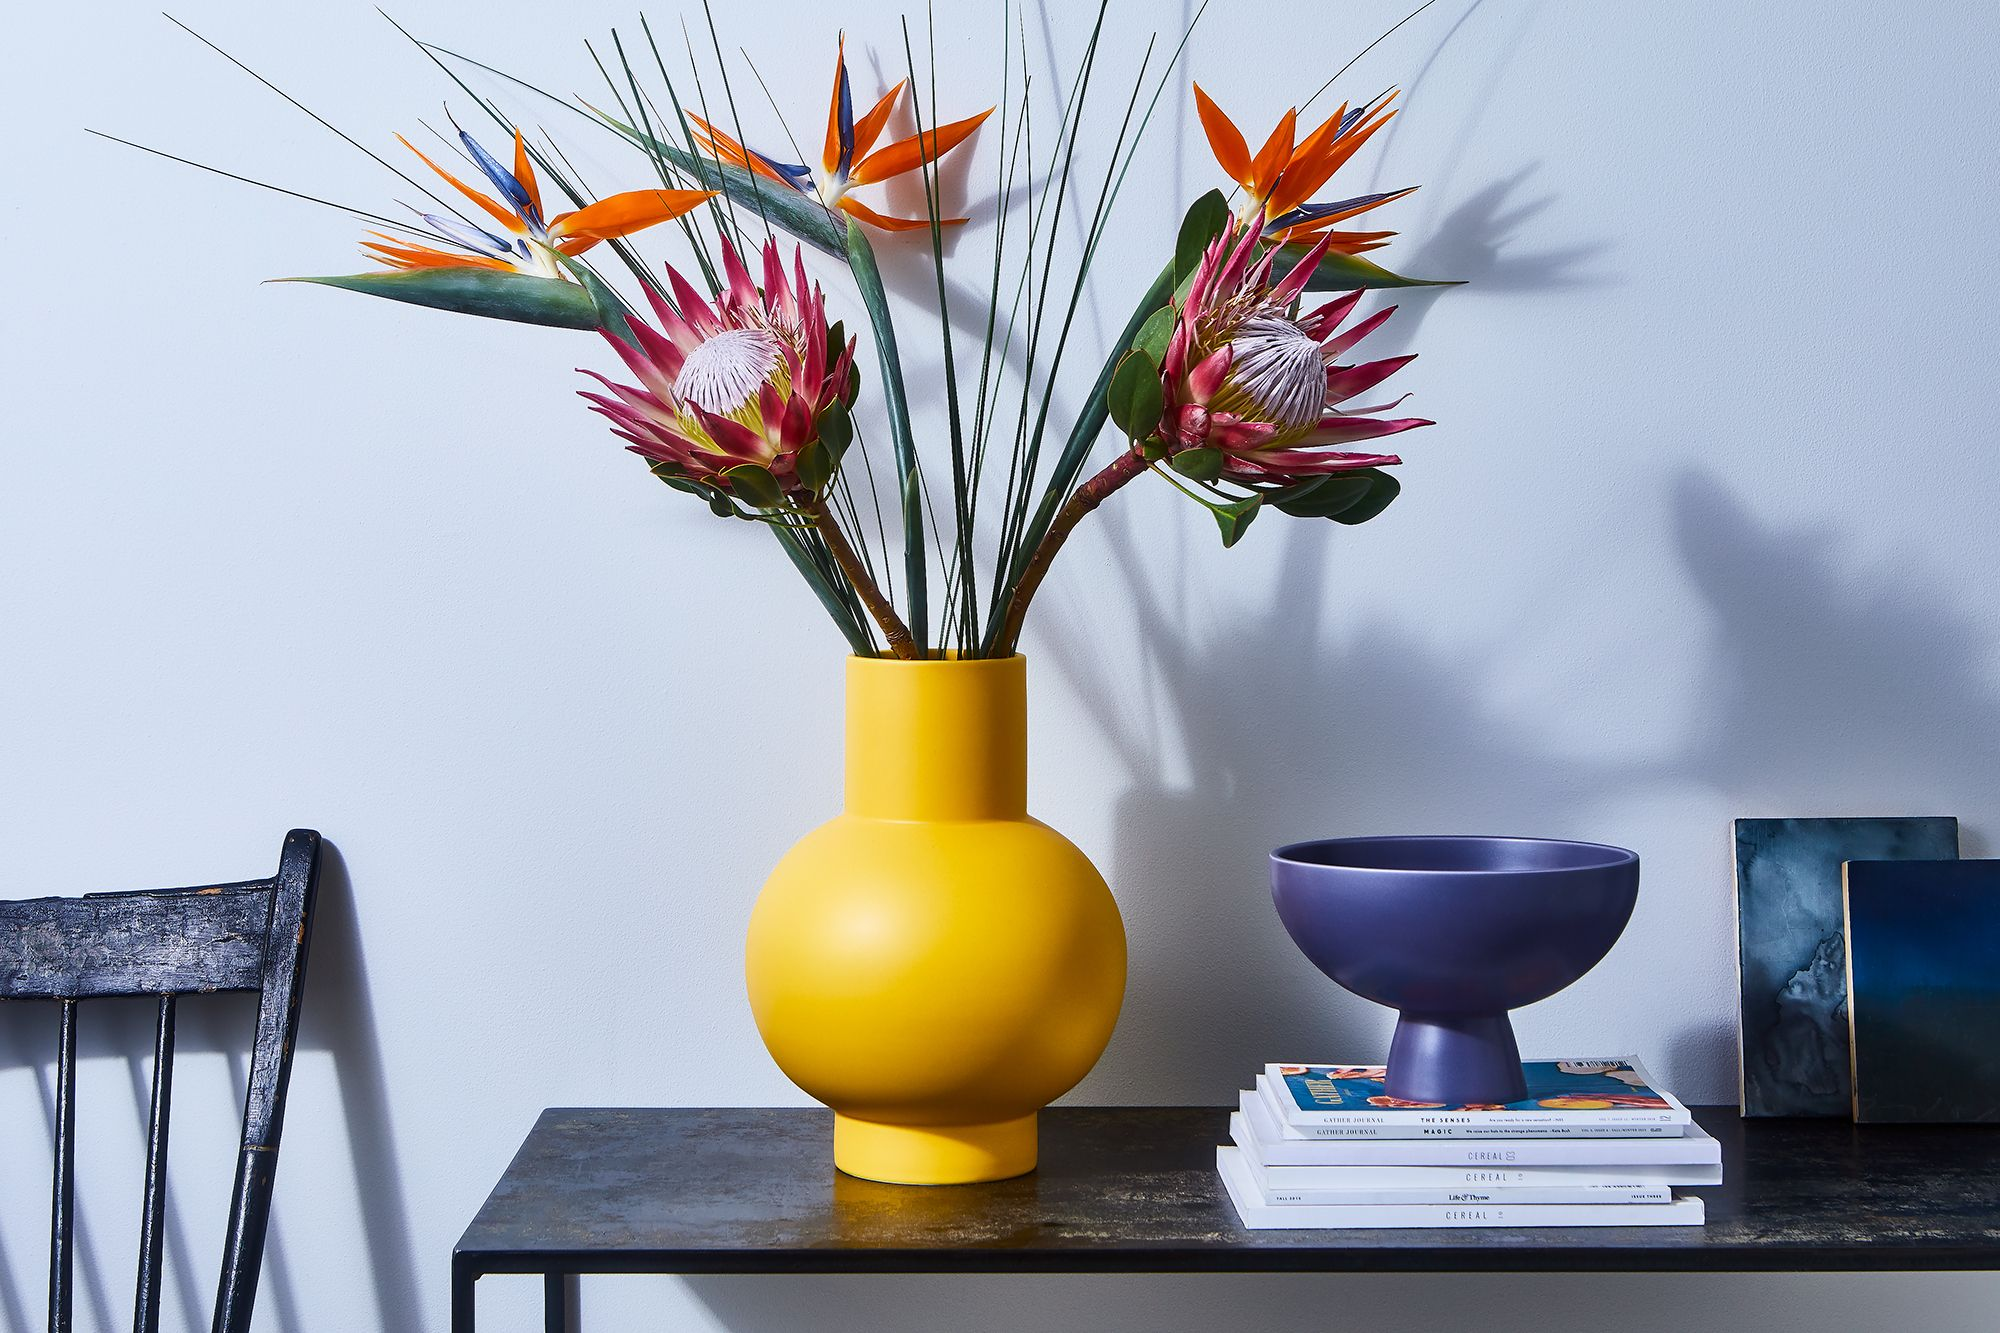 How to Design Joy Into Your Home